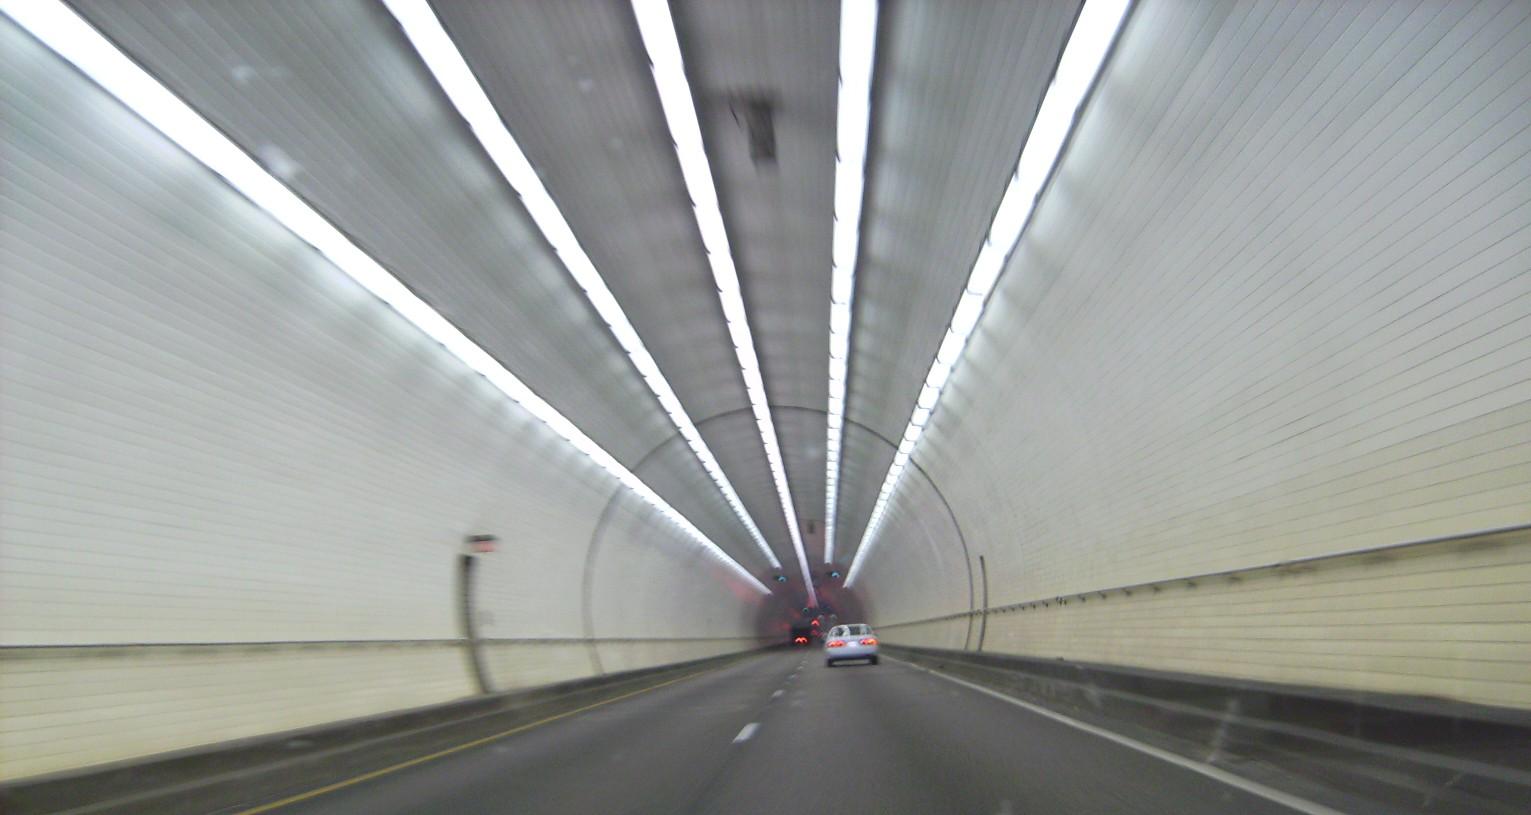 tunel_vision_002.JPG - 198104 Bytes